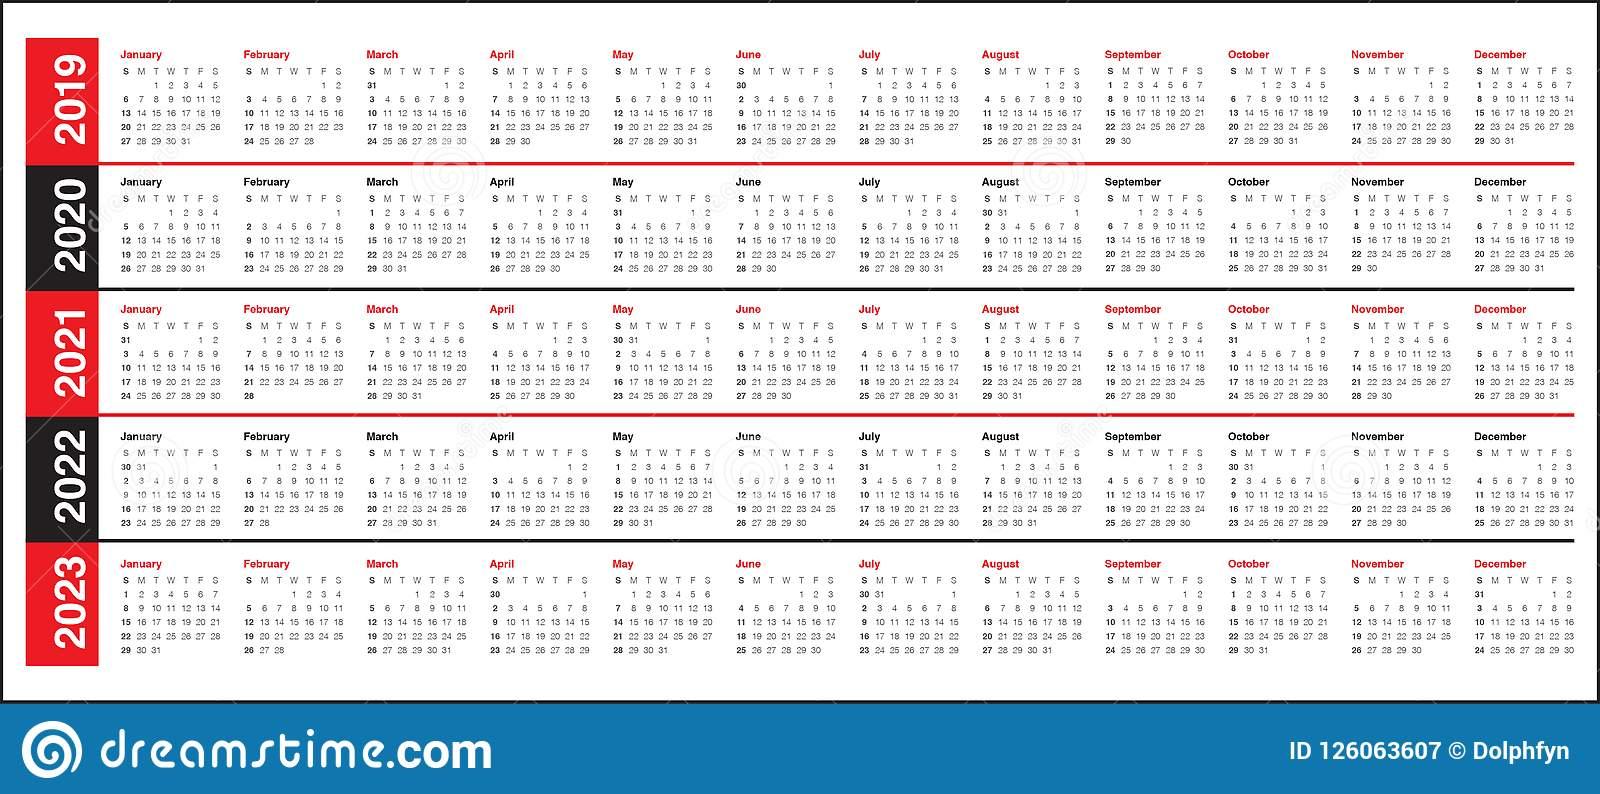 Free Prinable Calenders 2020 To 2023 | Calendar Template Regarding 4 5 4 Retail Calendar 2019 2022